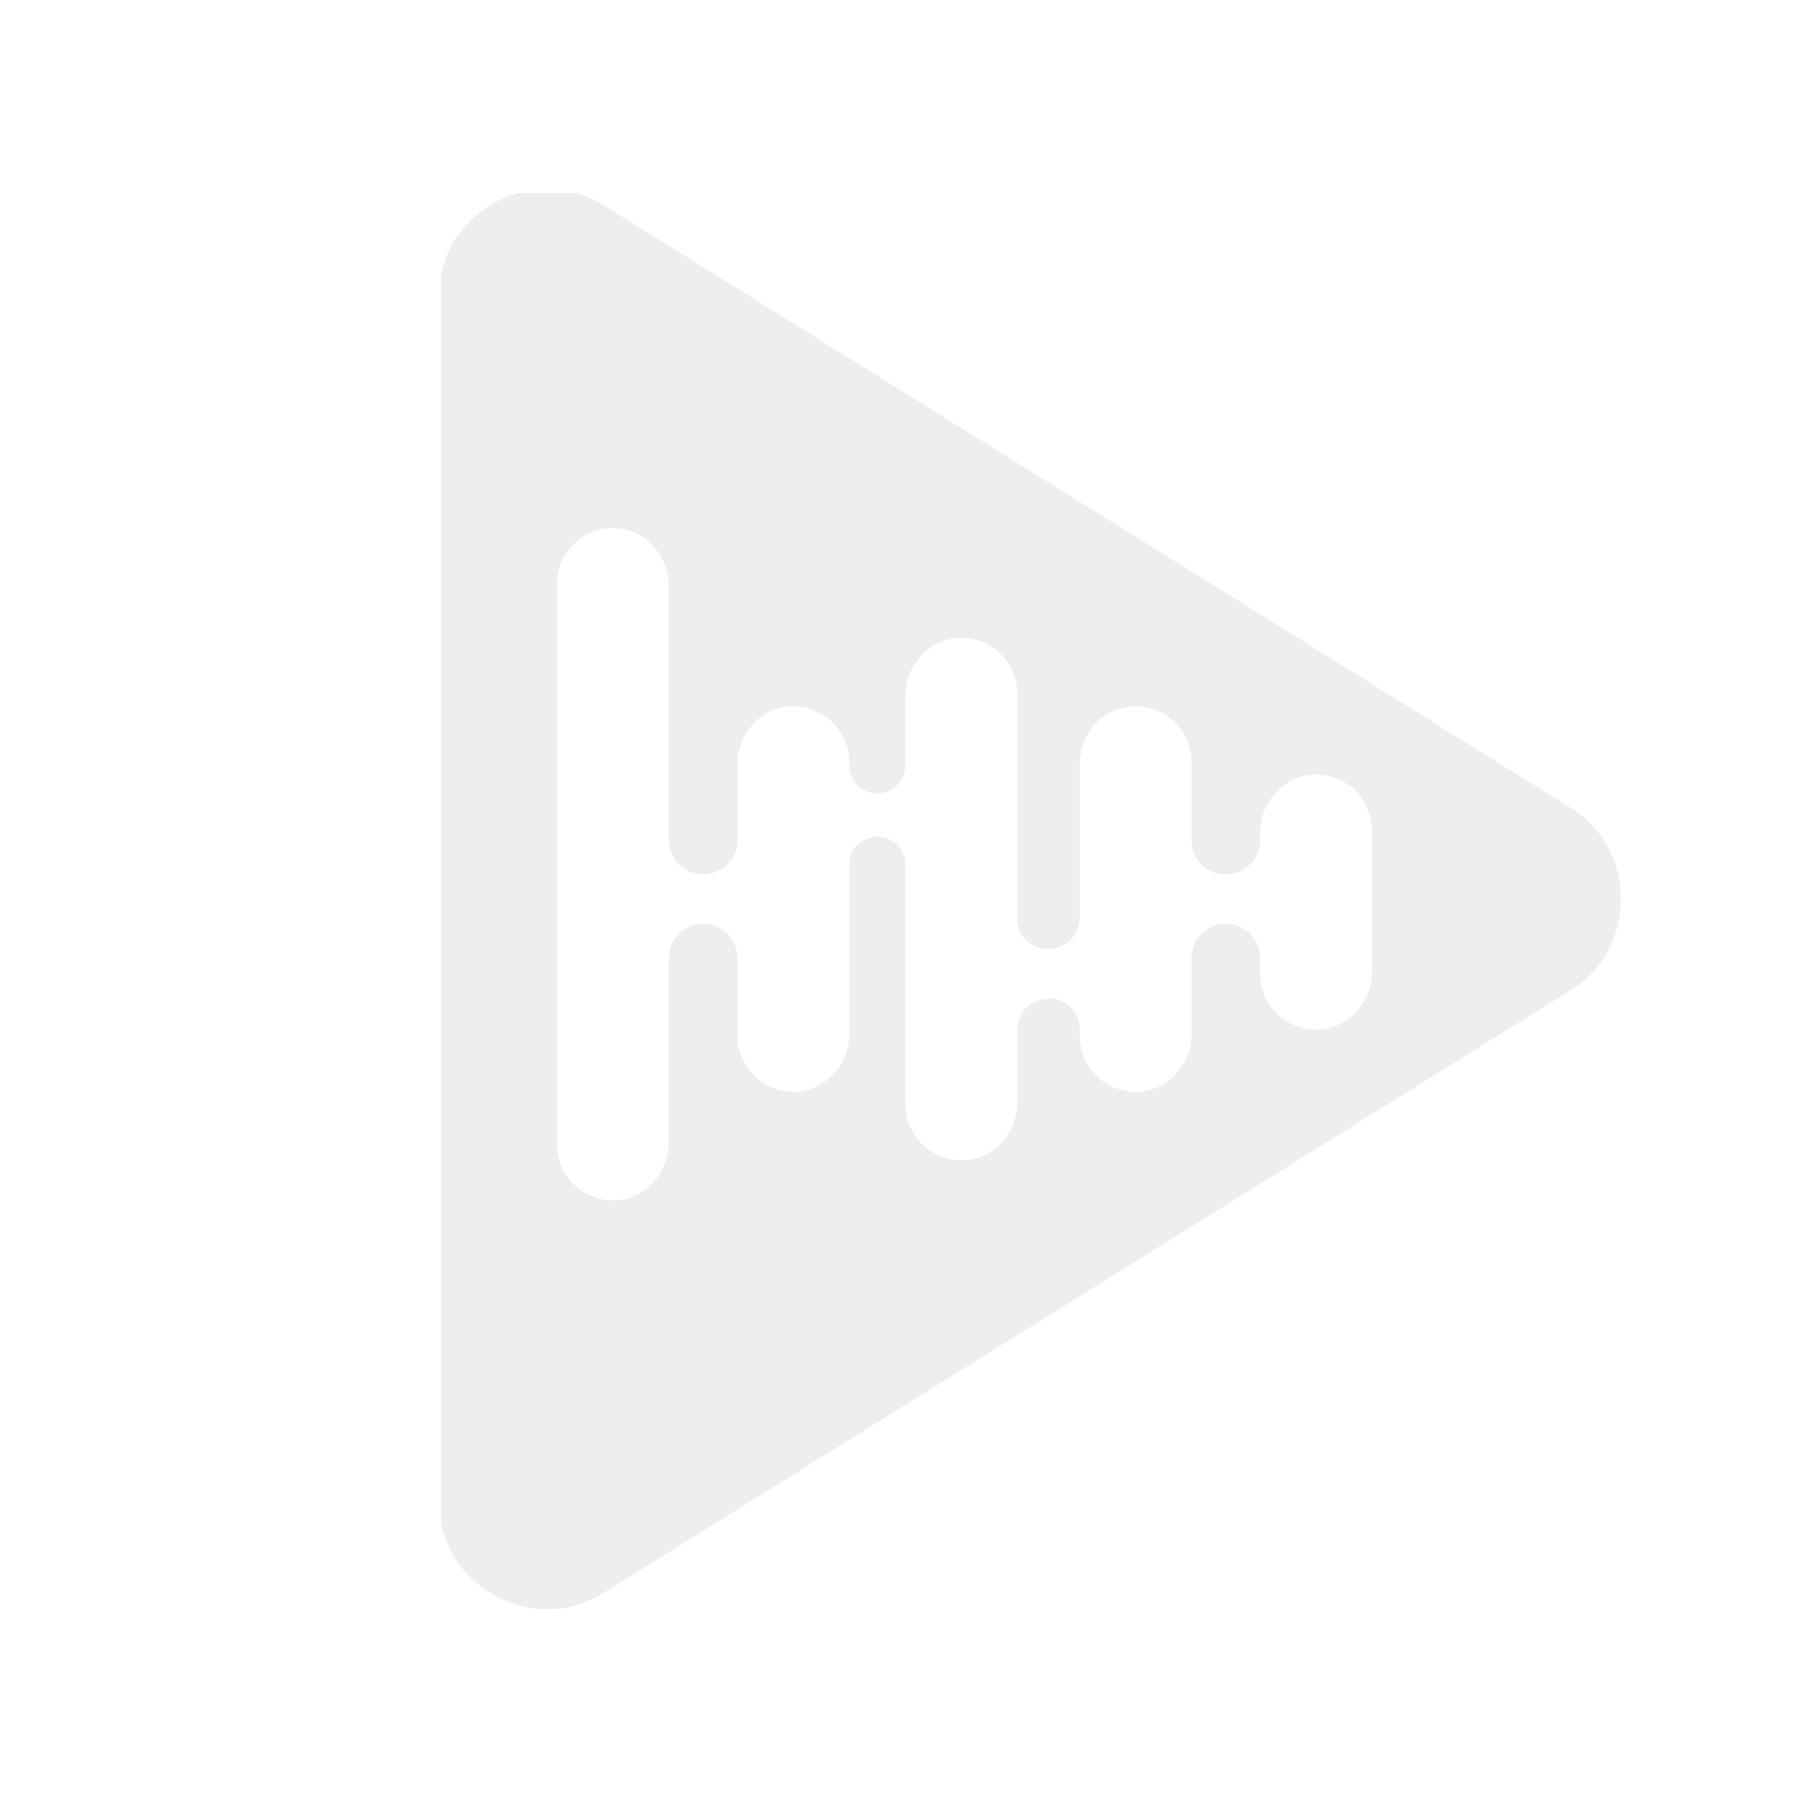 Kufatec Fiscon 36431-1 - Blåtann-integrering, Audi A4 (8K), A5, Q5 /m Concert/Symphony